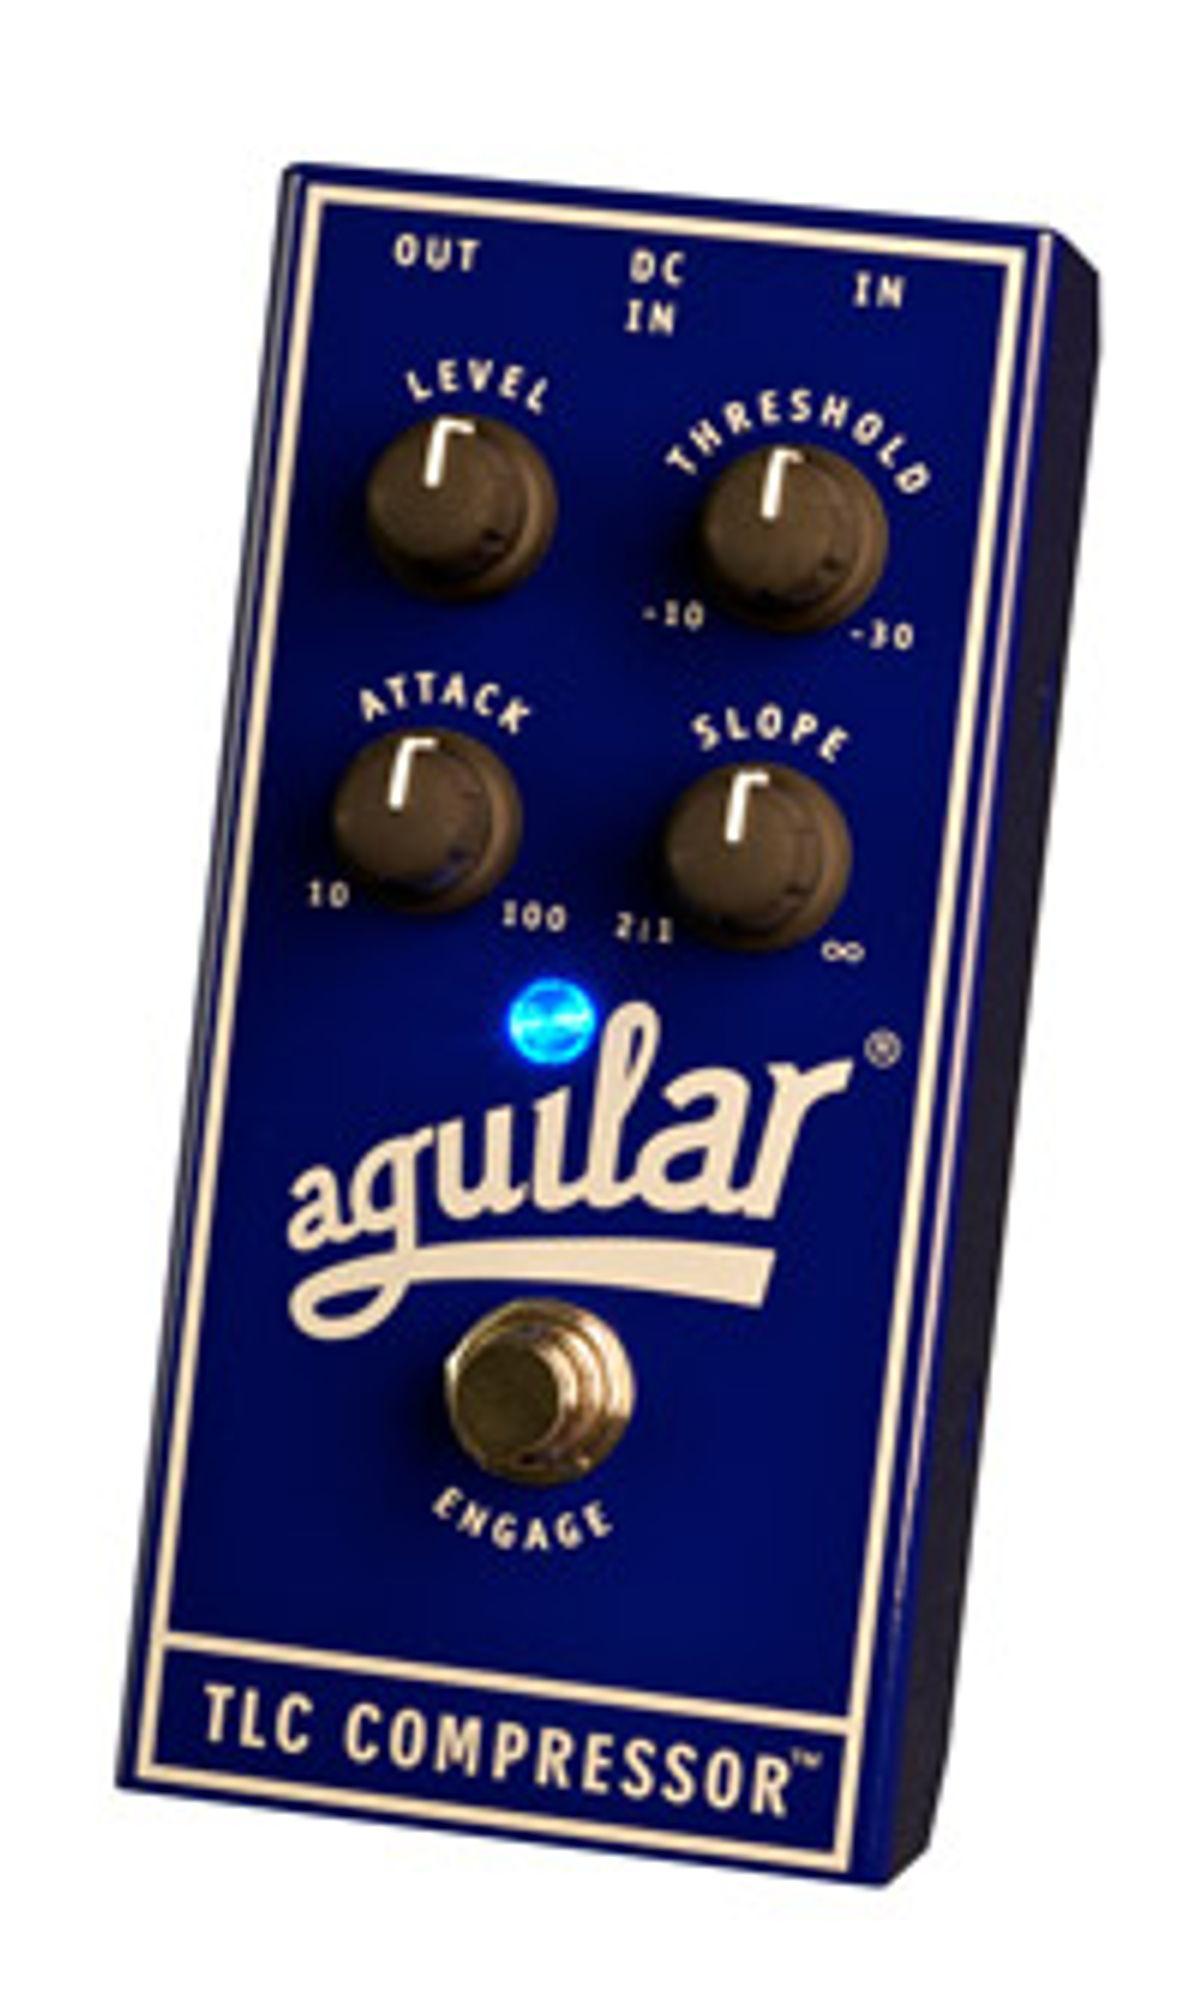 Aguilar Amplification Announces TLC Compressor